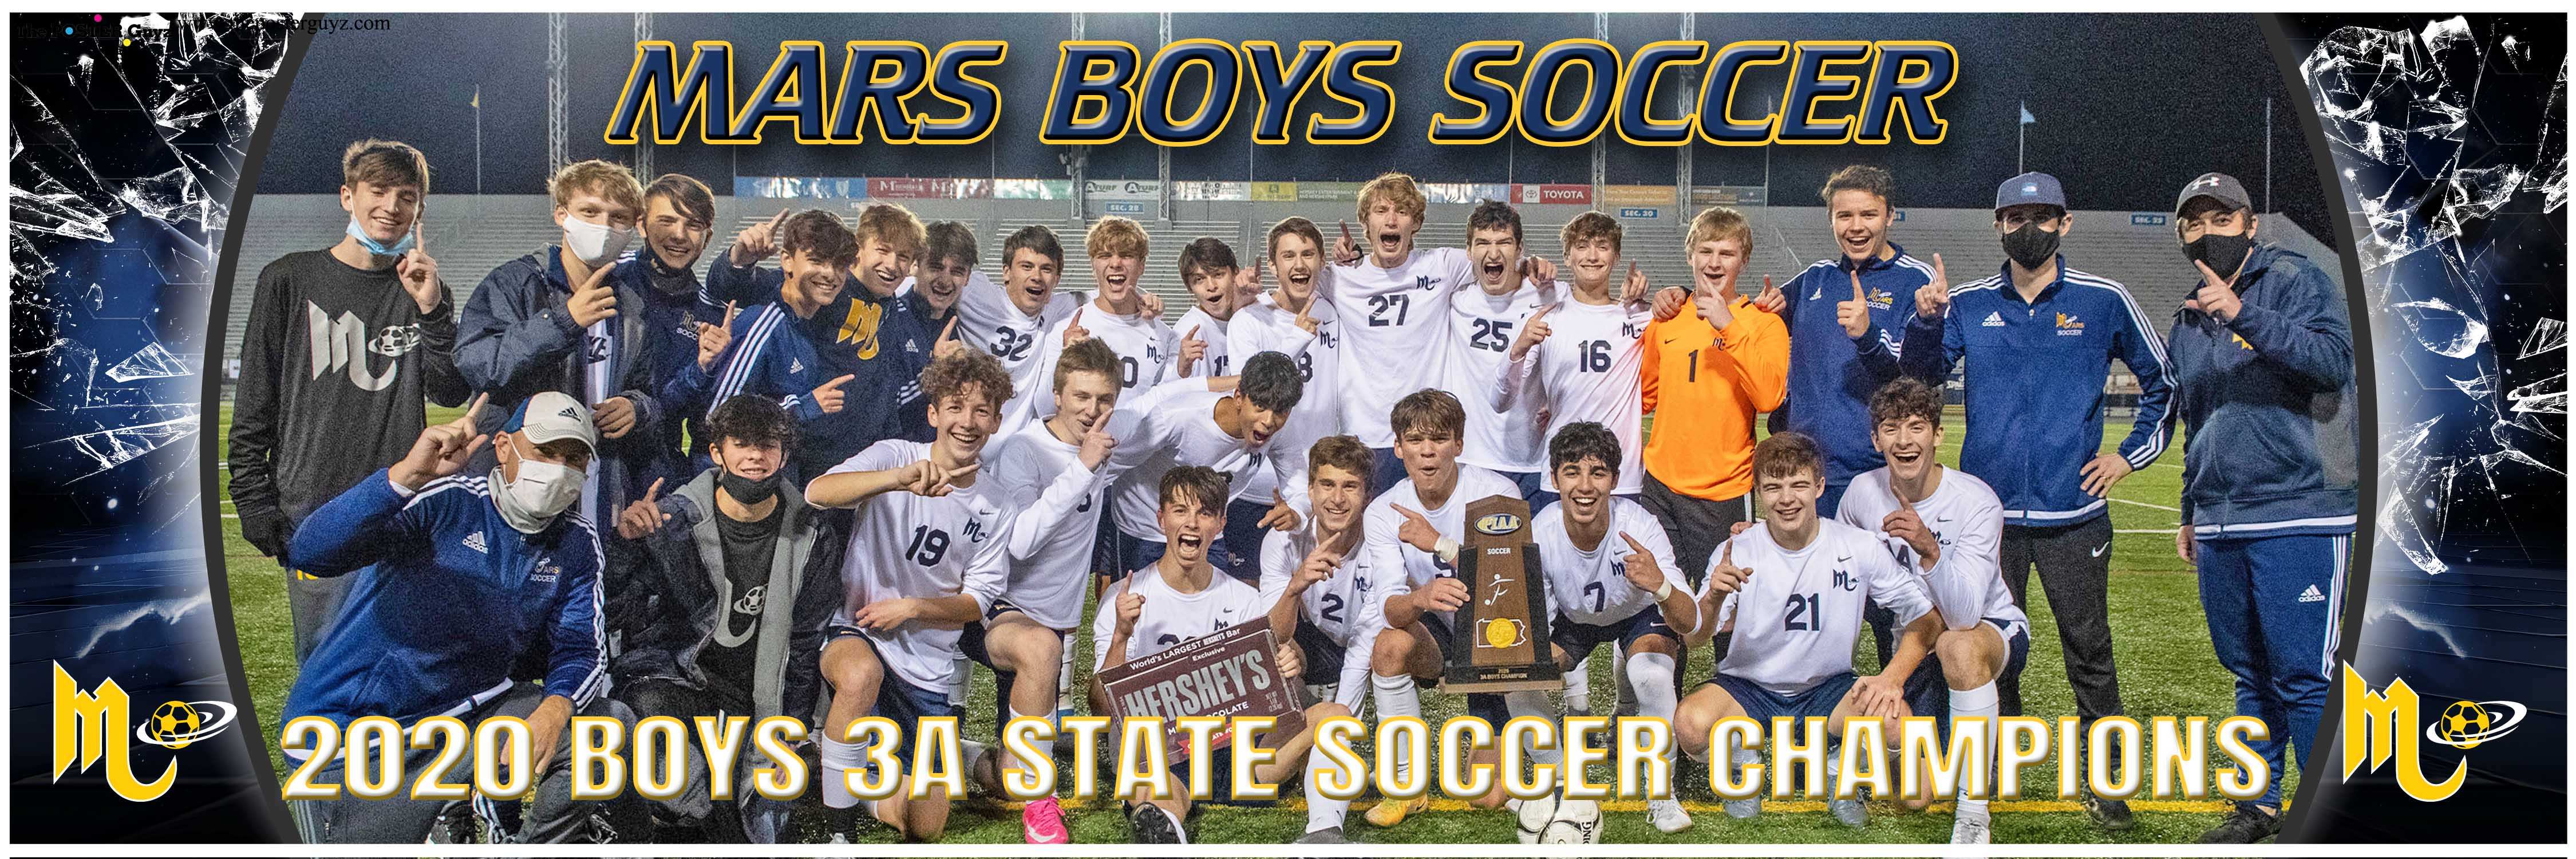 2020 Mars Boys Soccer PIAA Championship